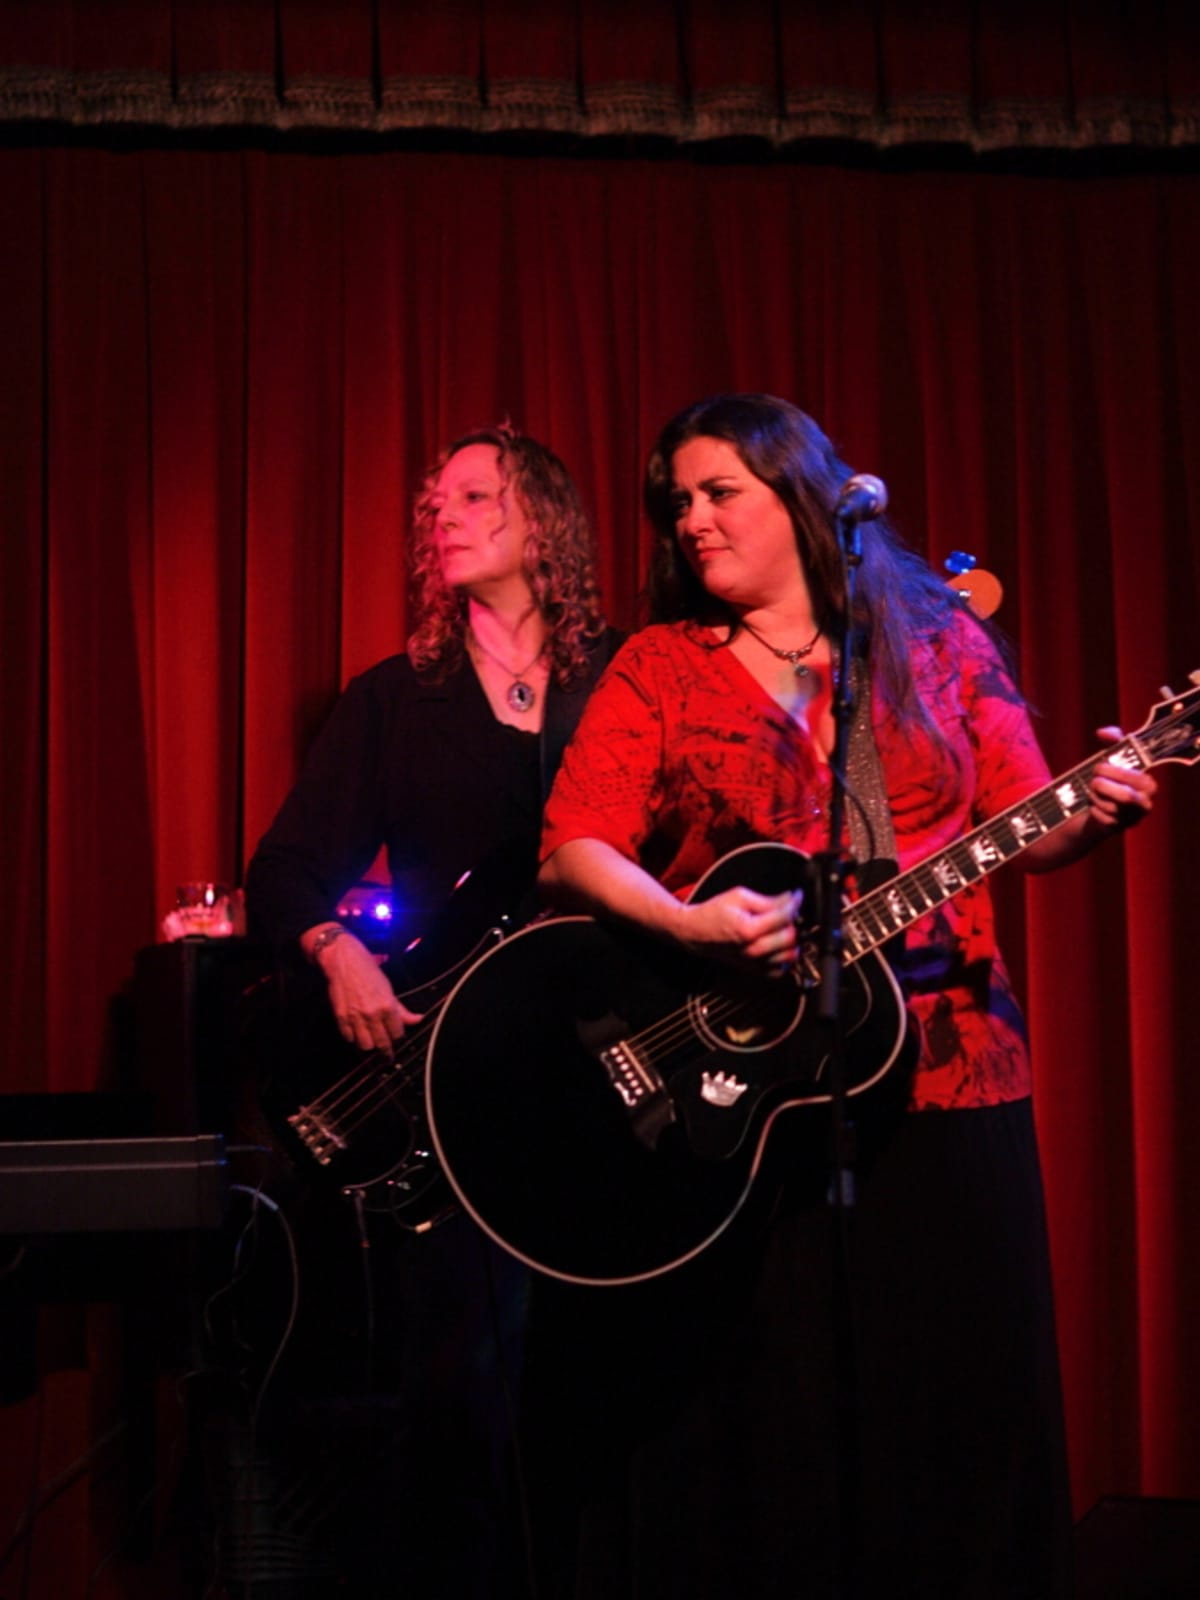 Austin Photo: Places_Live Music_Cactus Cafe_Stage